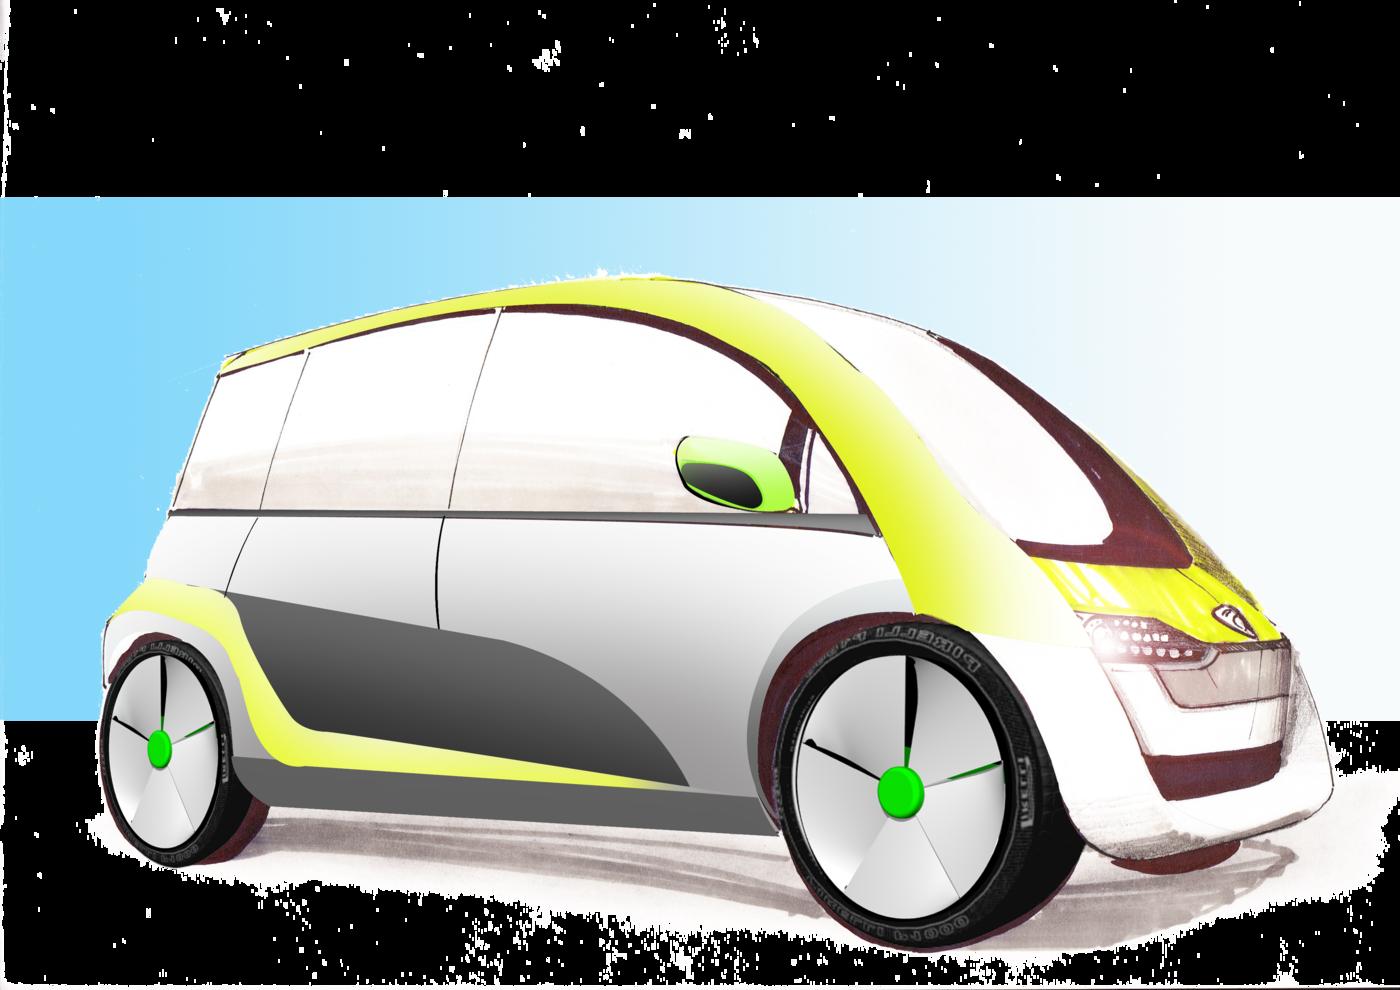 Proton City Car Major Project By Najmi Rosdi At Coroflot Com